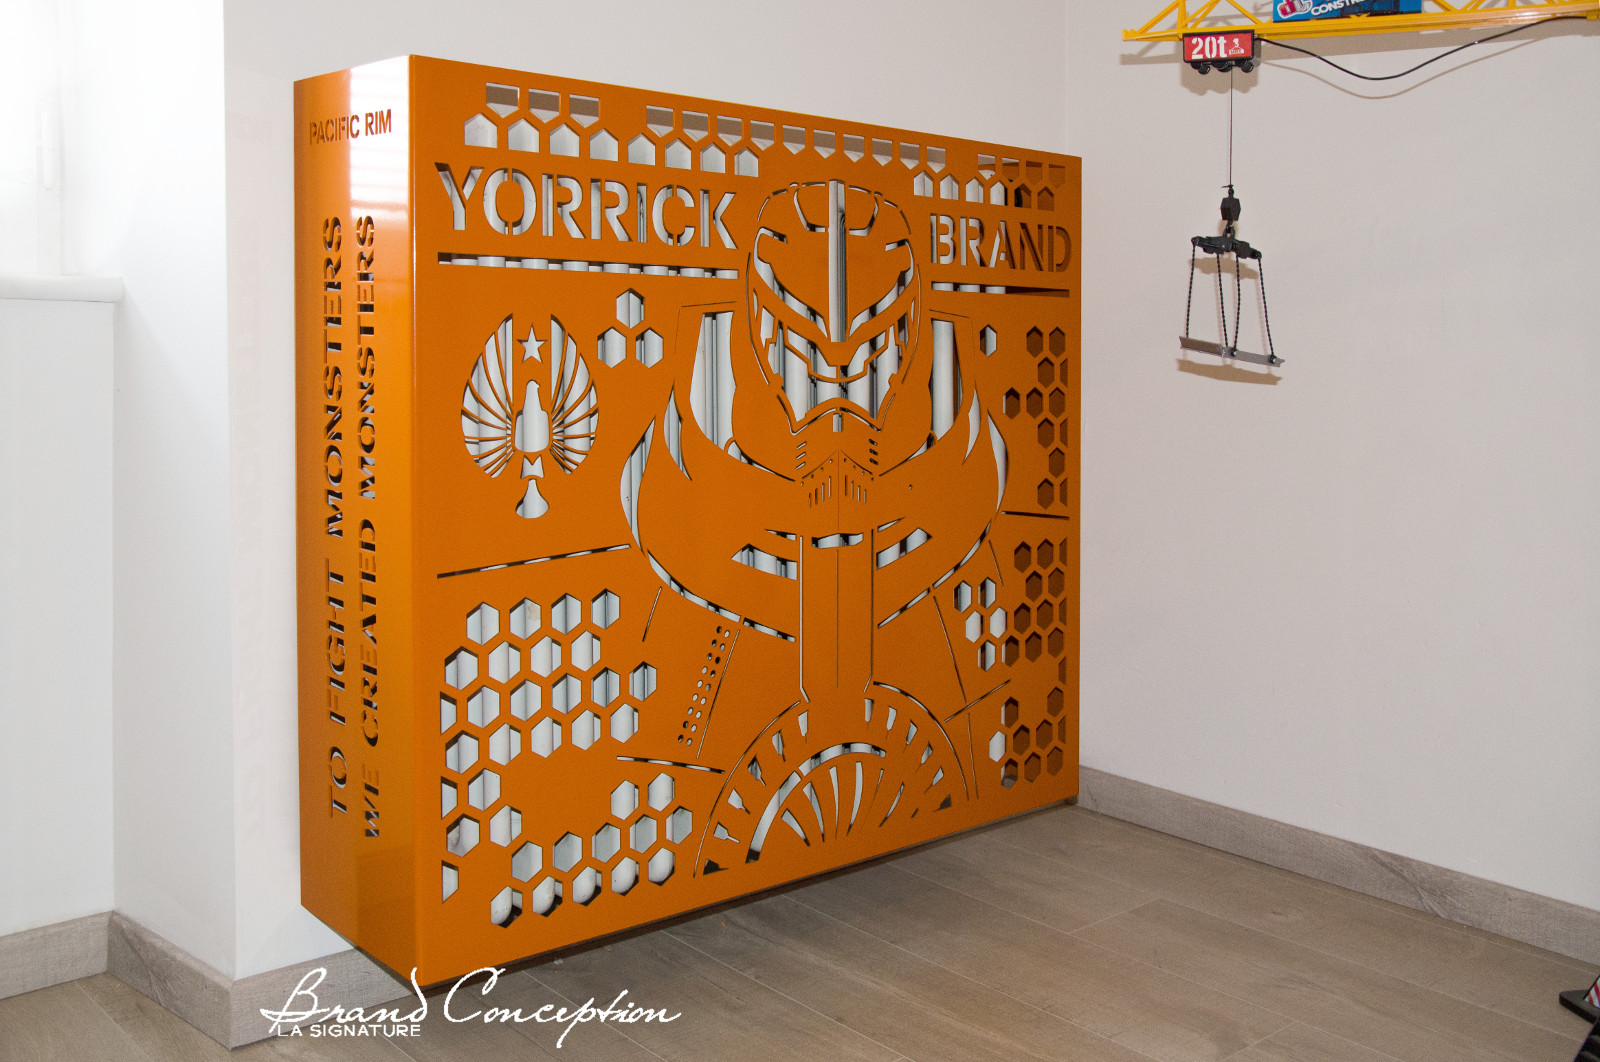 brand conception idea radiator cover. Black Bedroom Furniture Sets. Home Design Ideas